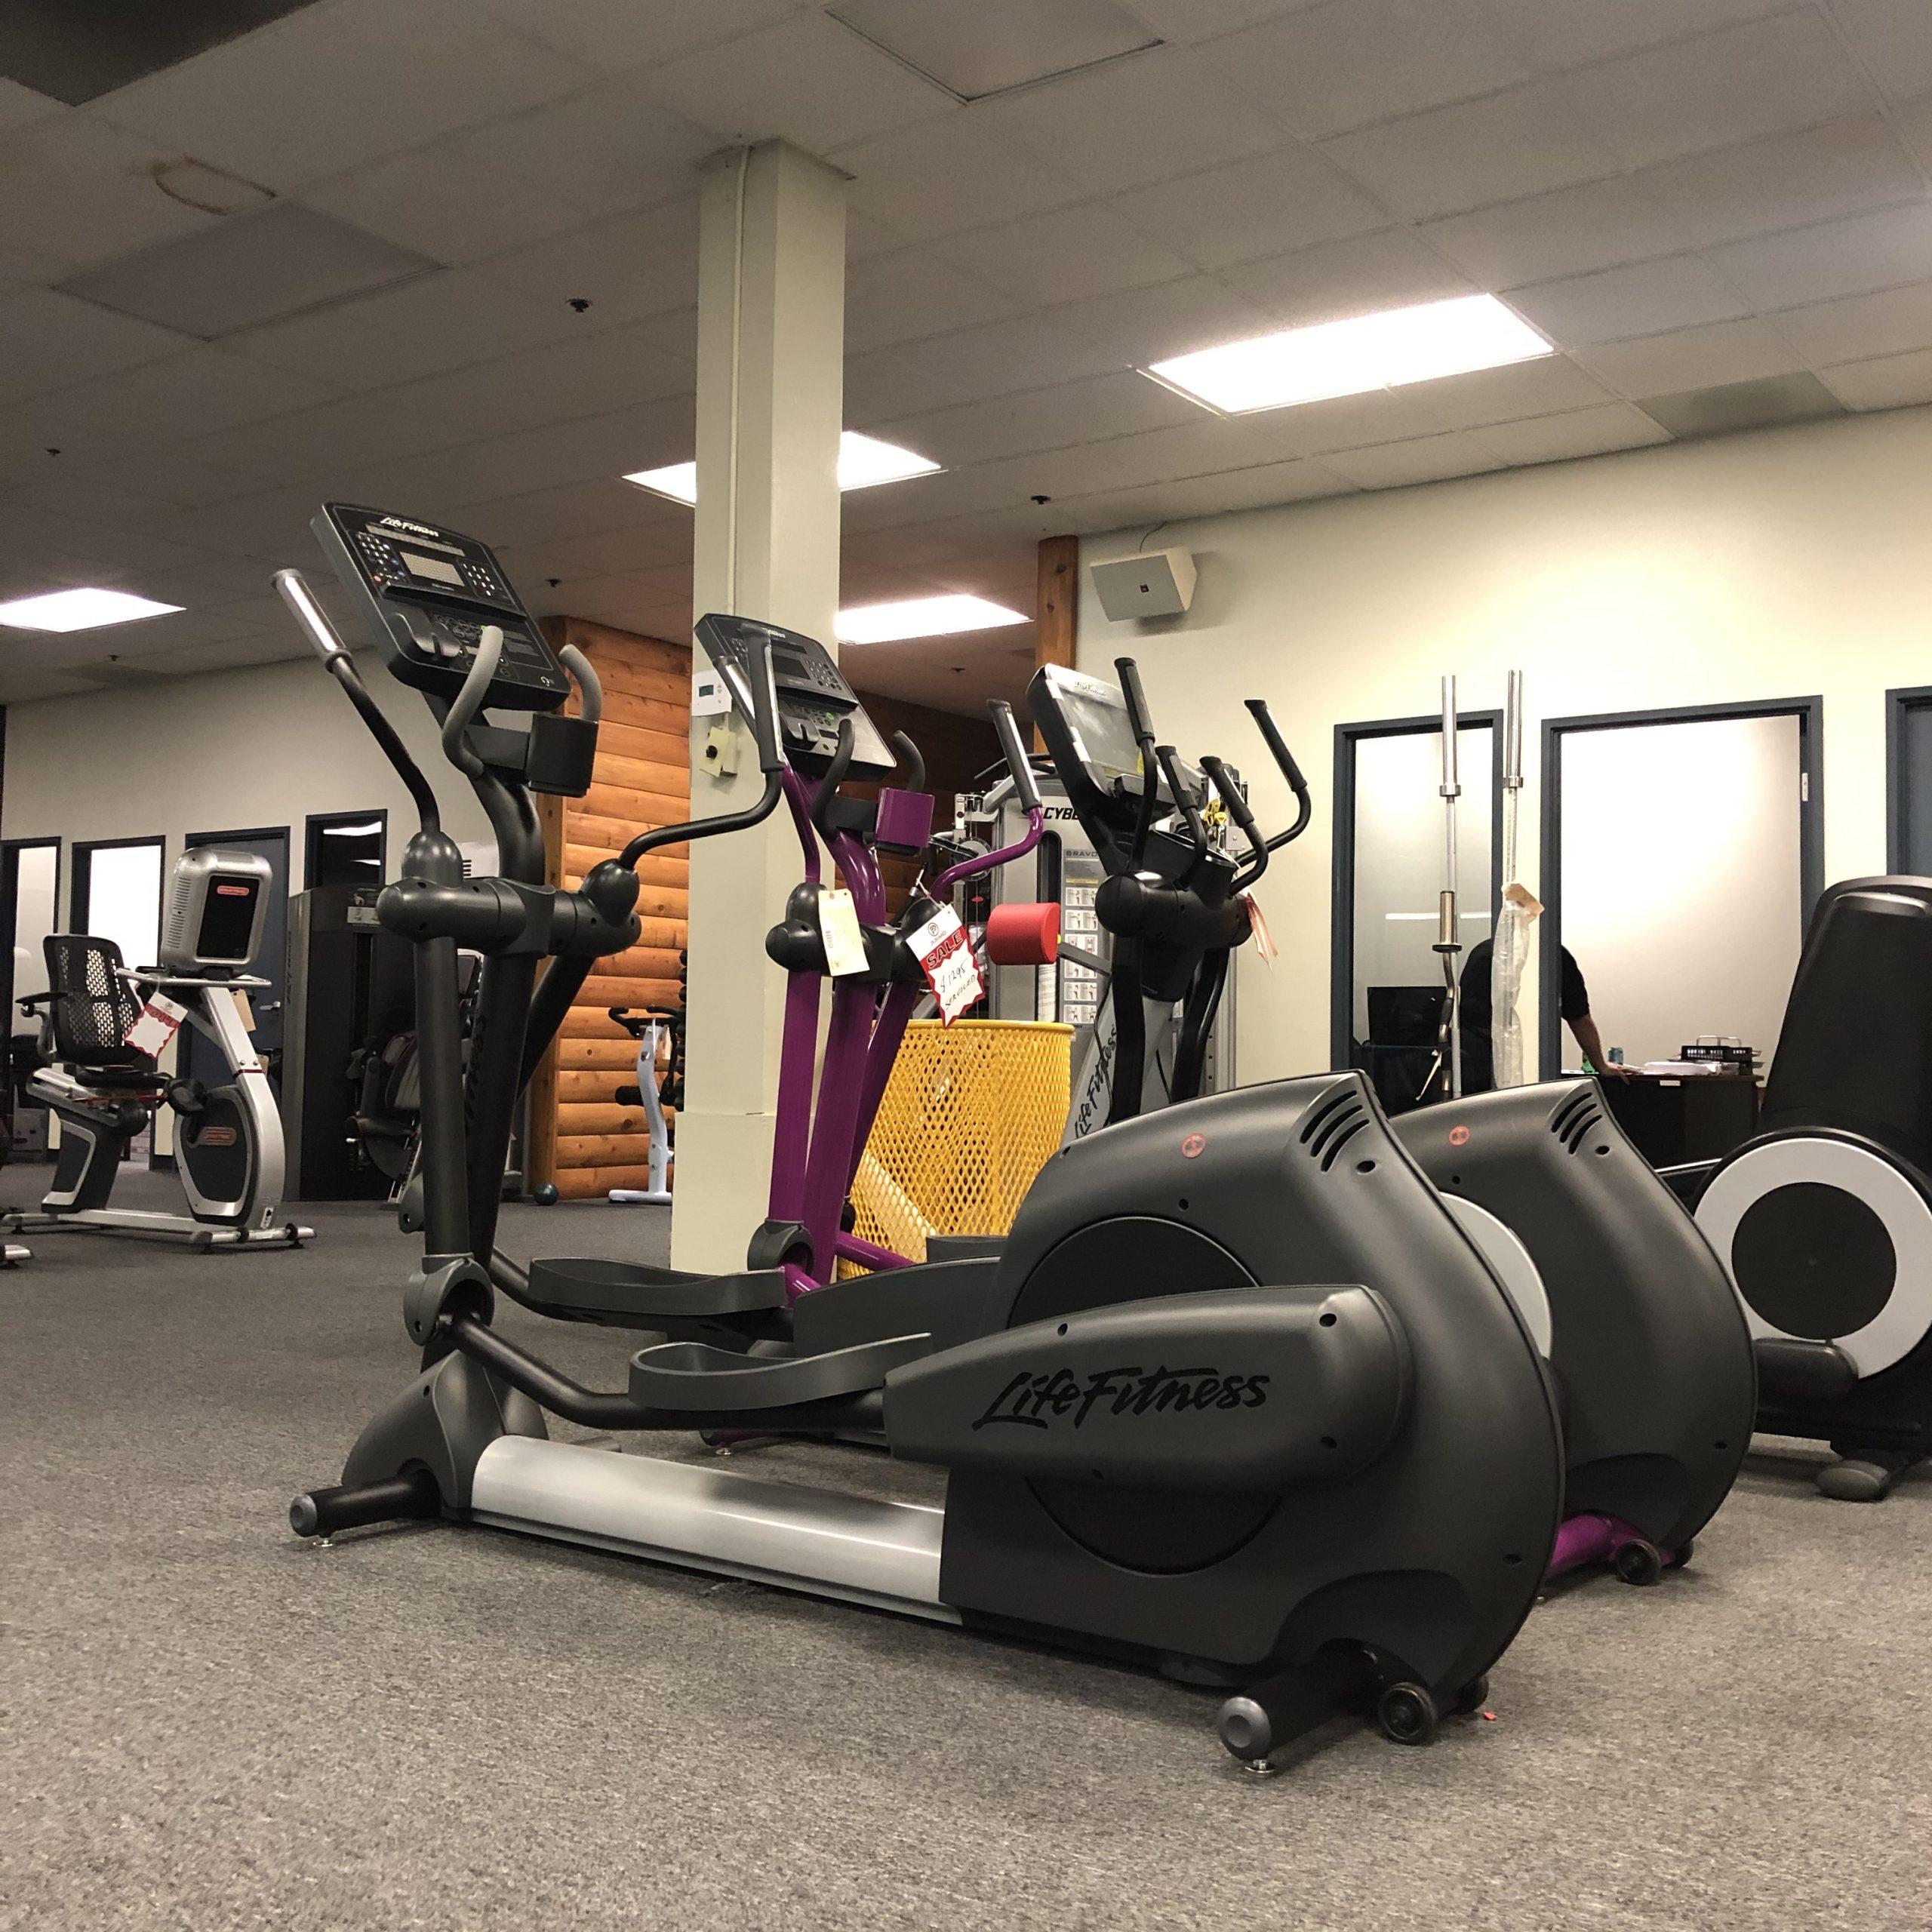 Life Fitness Integrity CLSX Elliptical Crosstrainer